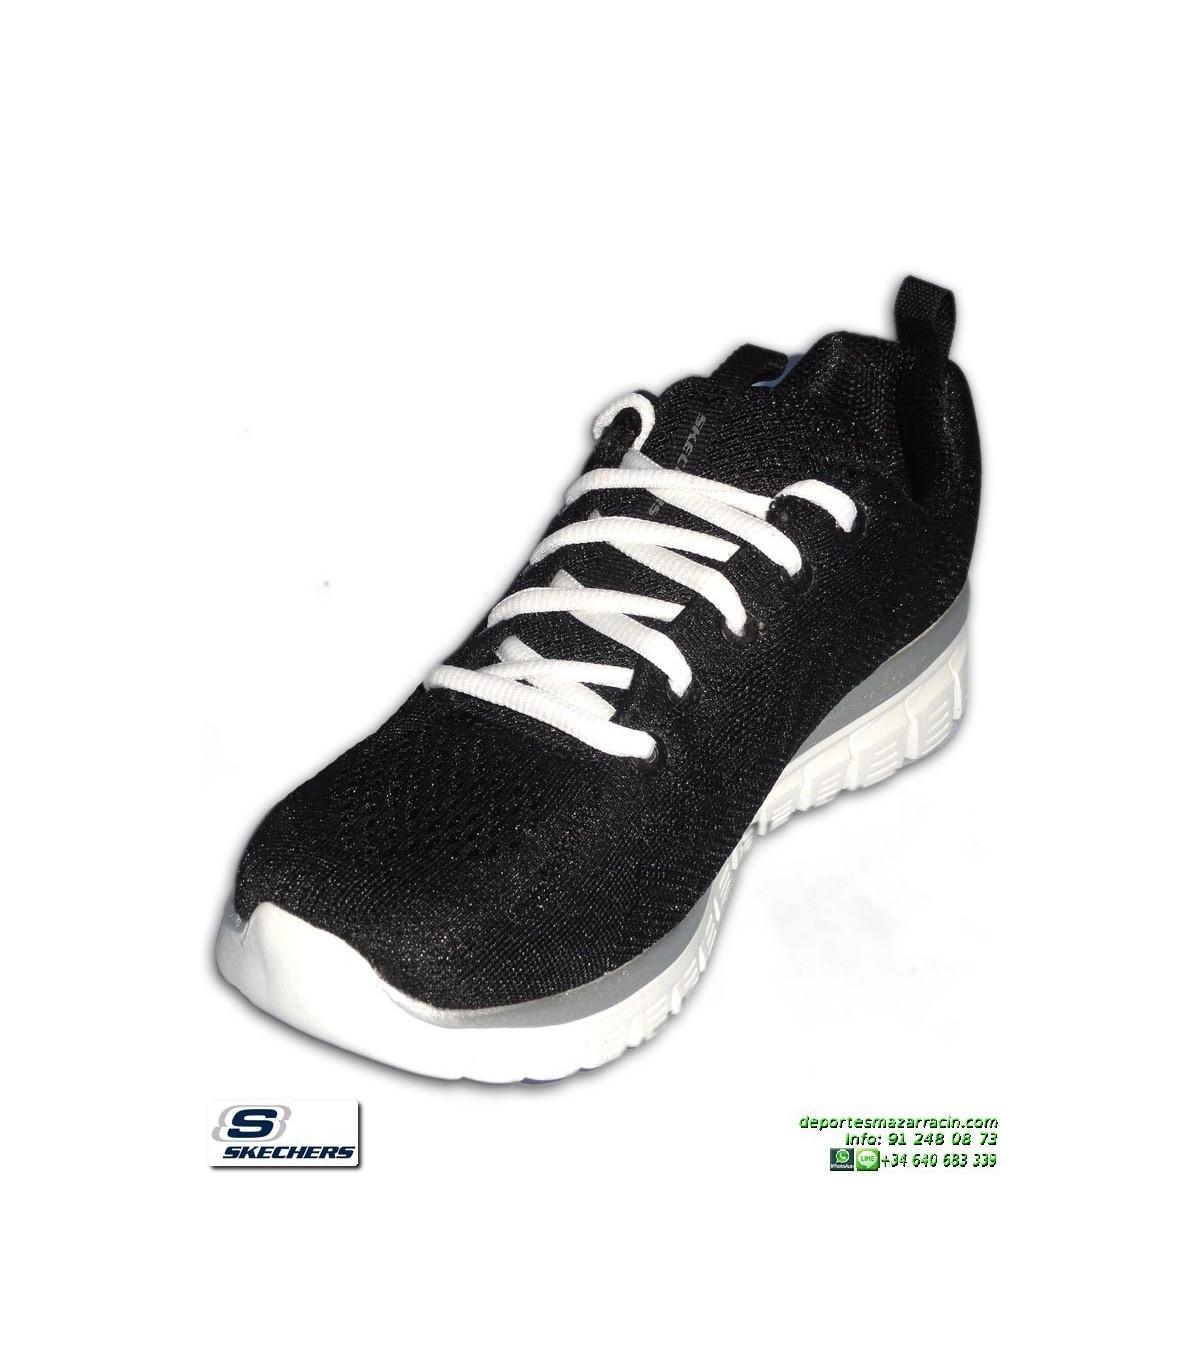 cf4cddd3b83 Deportiva Skechers Mujer GRACEFUL Get Connected Negro-Blanco 12615 BKW  PANTILLA Memory Foam. Deportiva Skechers ...